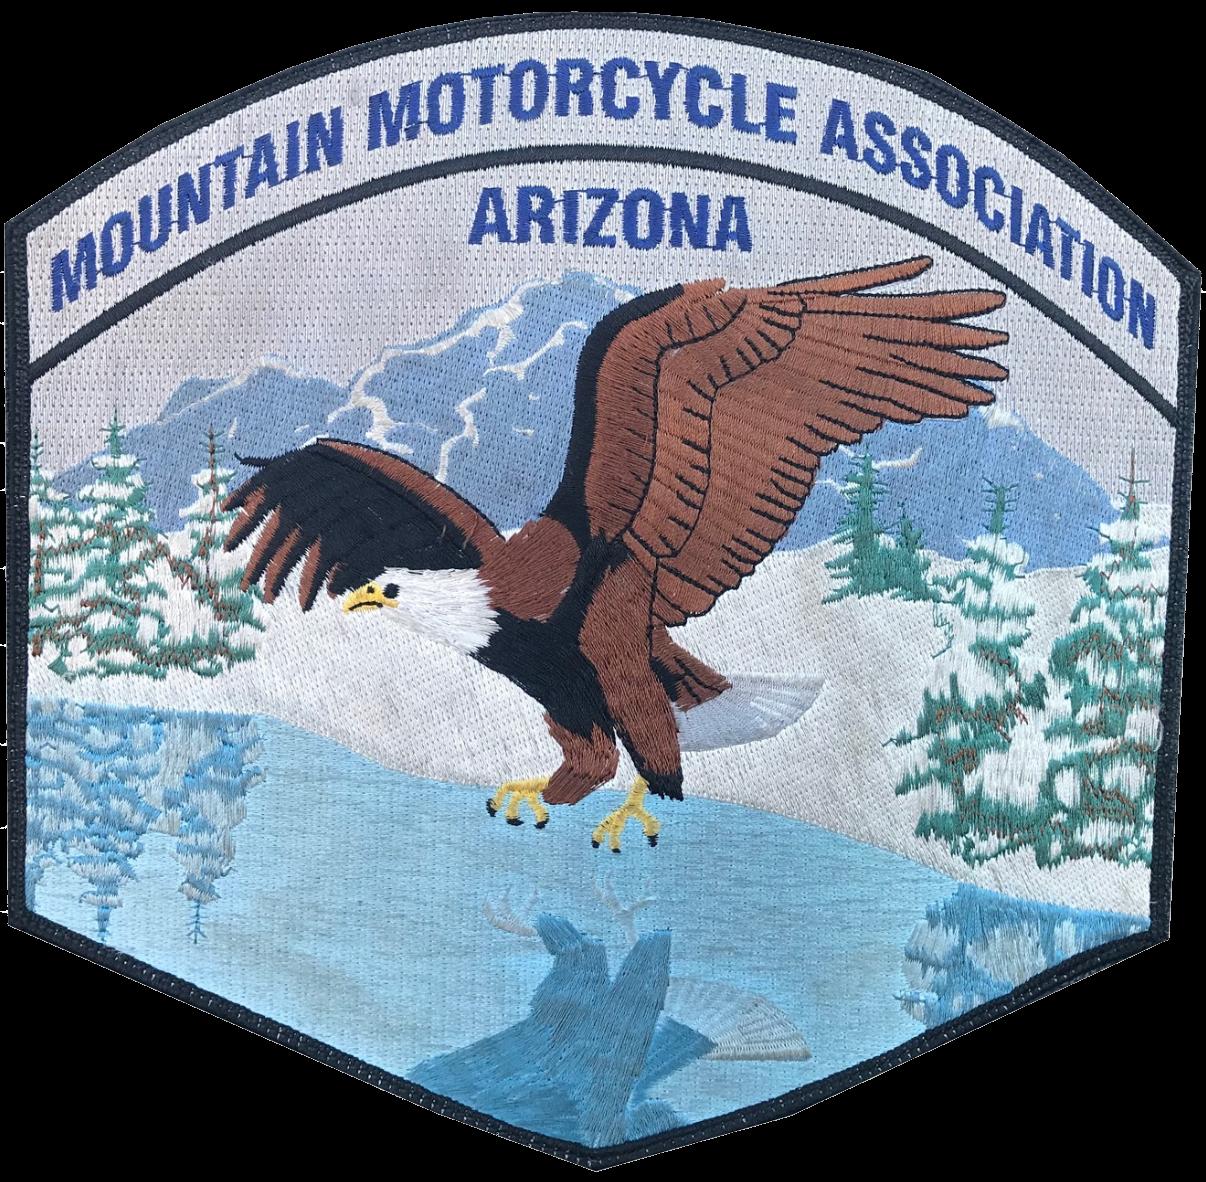 Mountain Motorcycle Association of AZ, Inc.